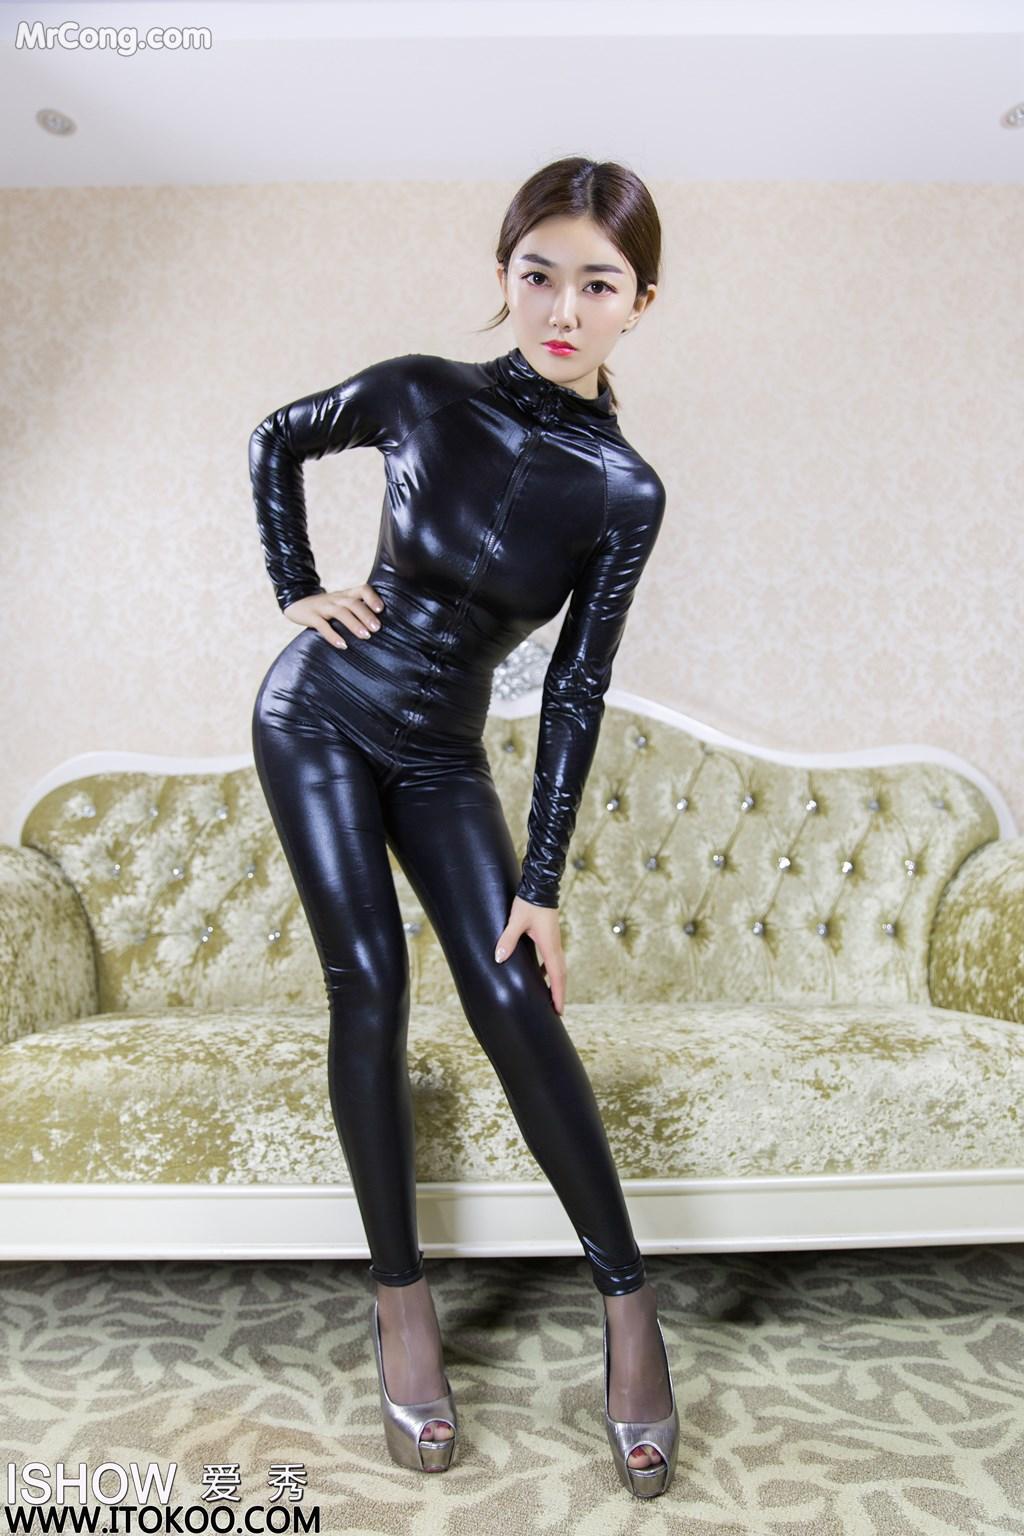 Image ISHOW-No.183-Caroline-MrCong.com-001 in post ISHOW No.183: Người mẫu 林琳Caroline (40 ảnh)